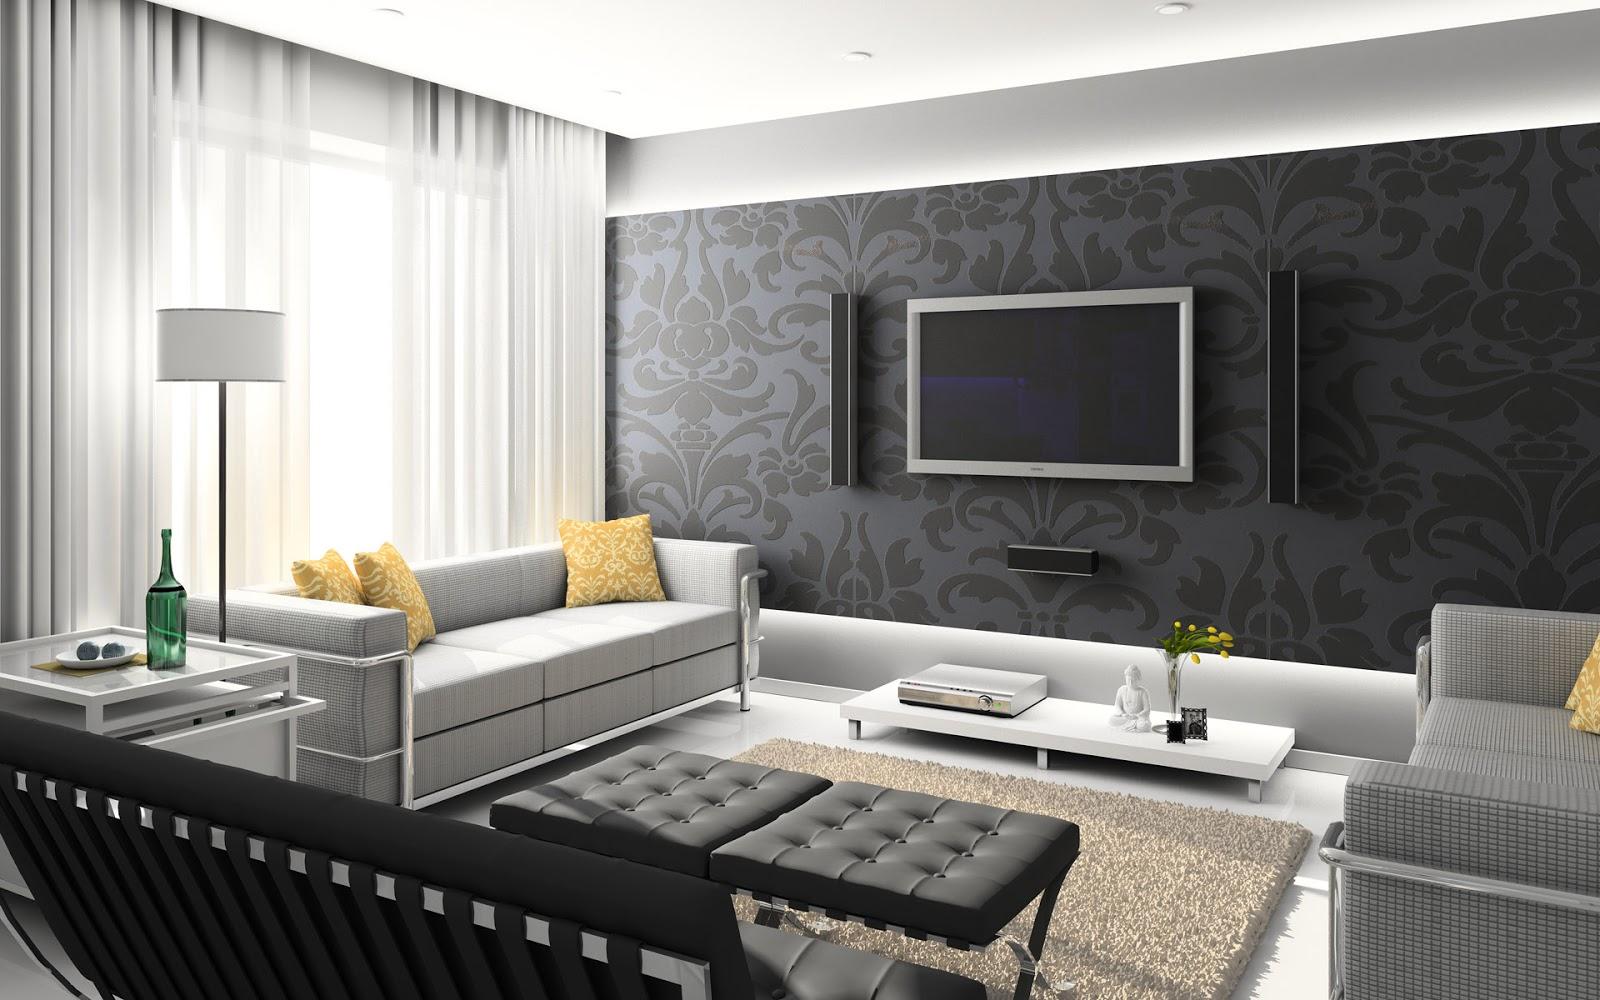 Best Kitchen Gallery: My Home Plan Home Decor Wallpaper Designs of Home Wallpaper Designs  on rachelxblog.com